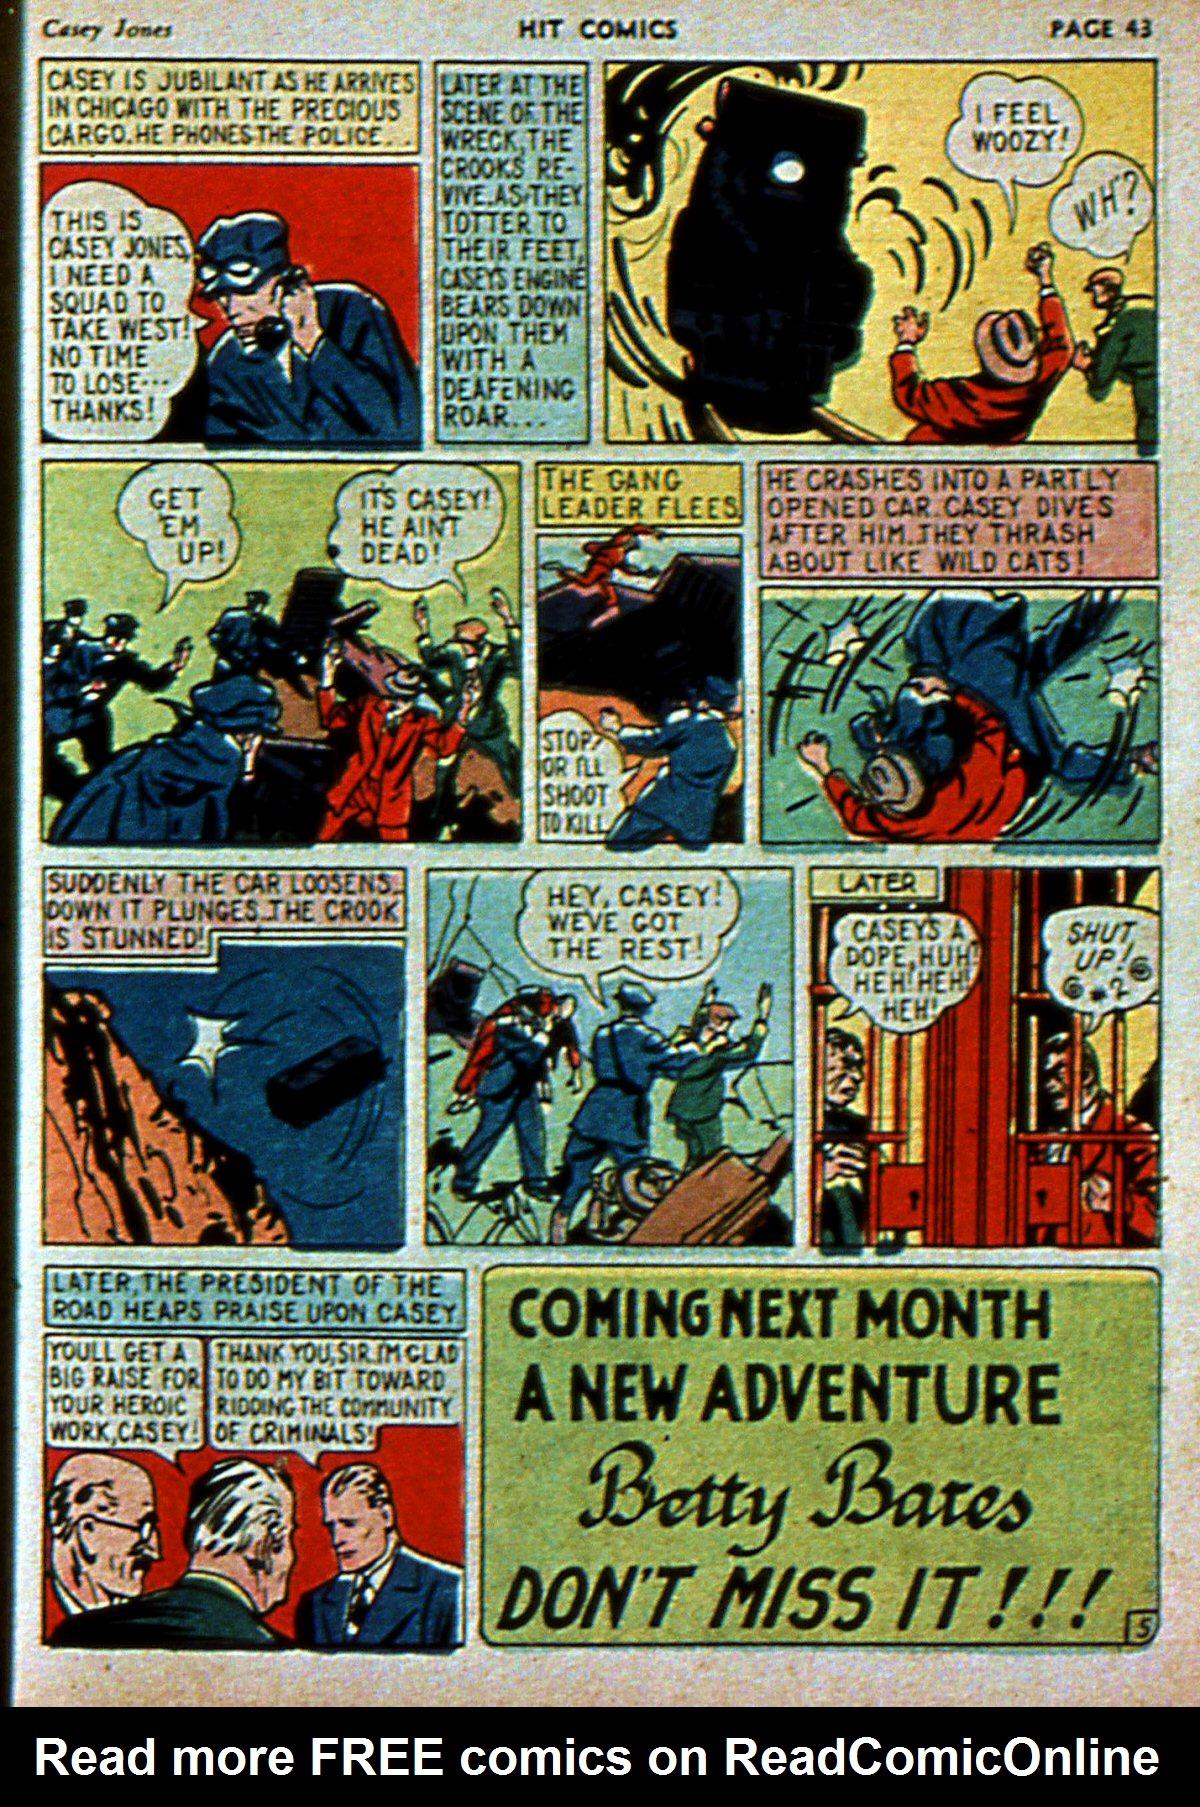 Read online Hit Comics comic -  Issue #3 - 45